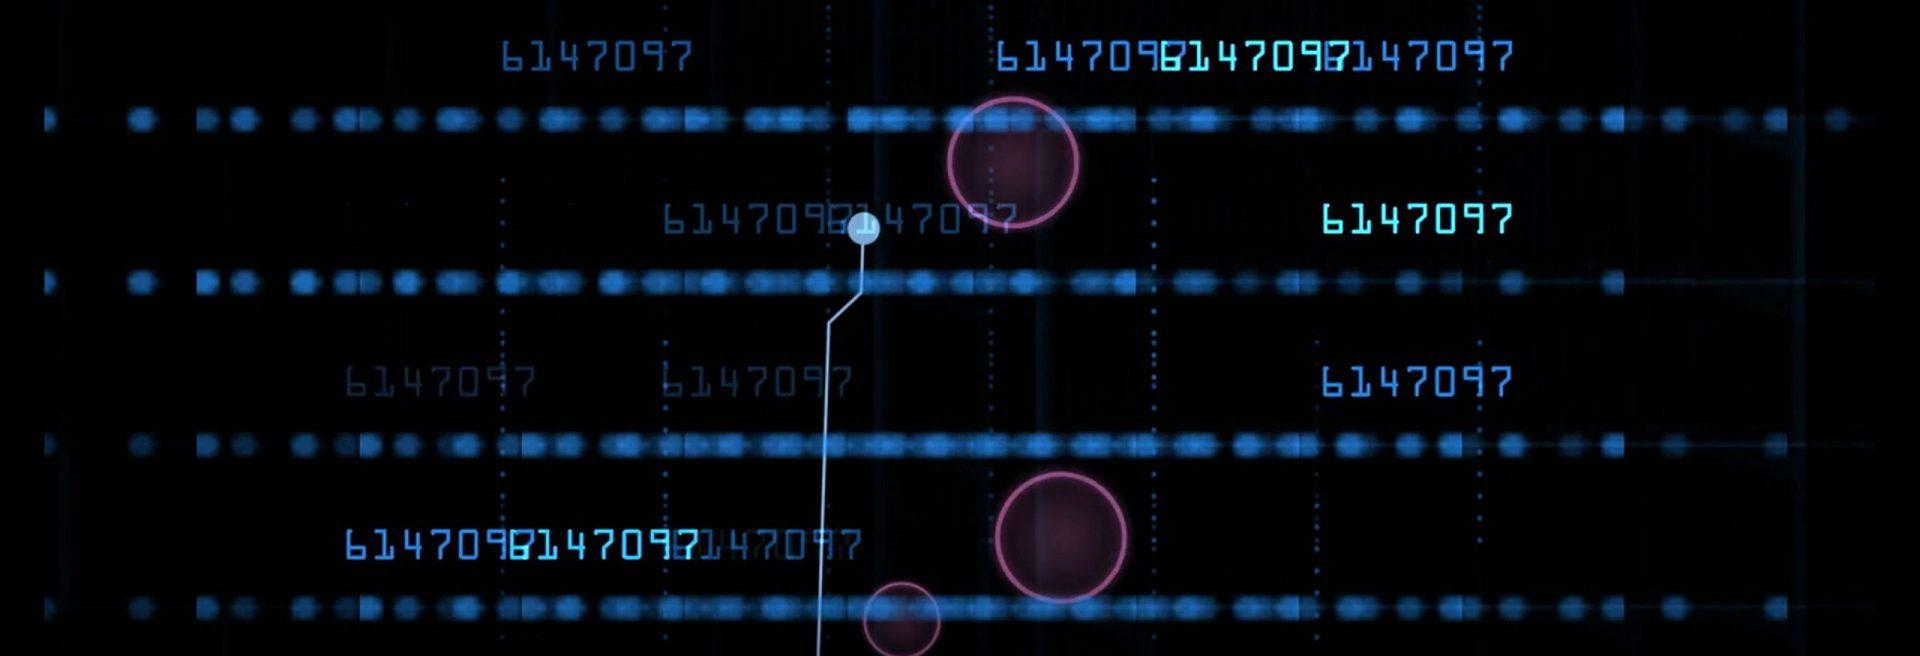 coder-slider-background-scaled